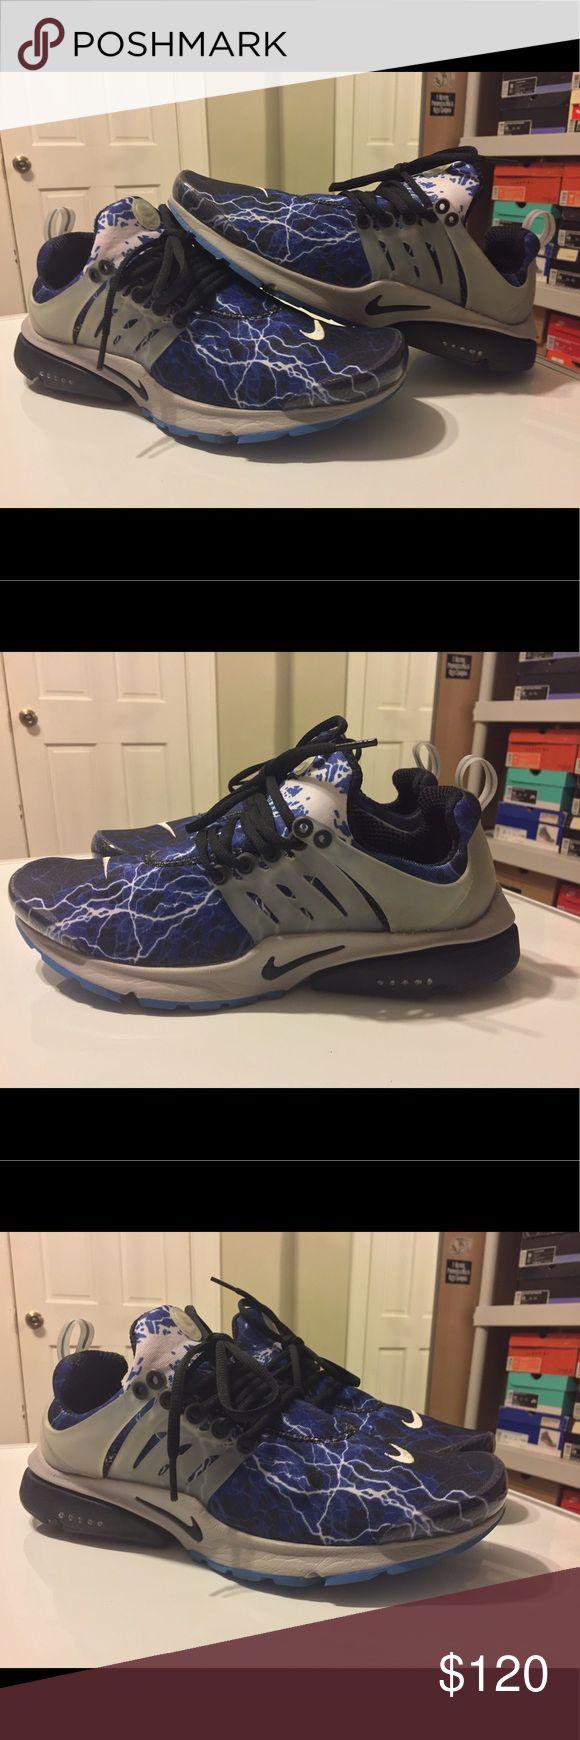 Mens Nike Presto Lightning Size M 10-11 Nike presto lightning   Size: m (10-11)  Great condition! Nike Shoes Sneakers